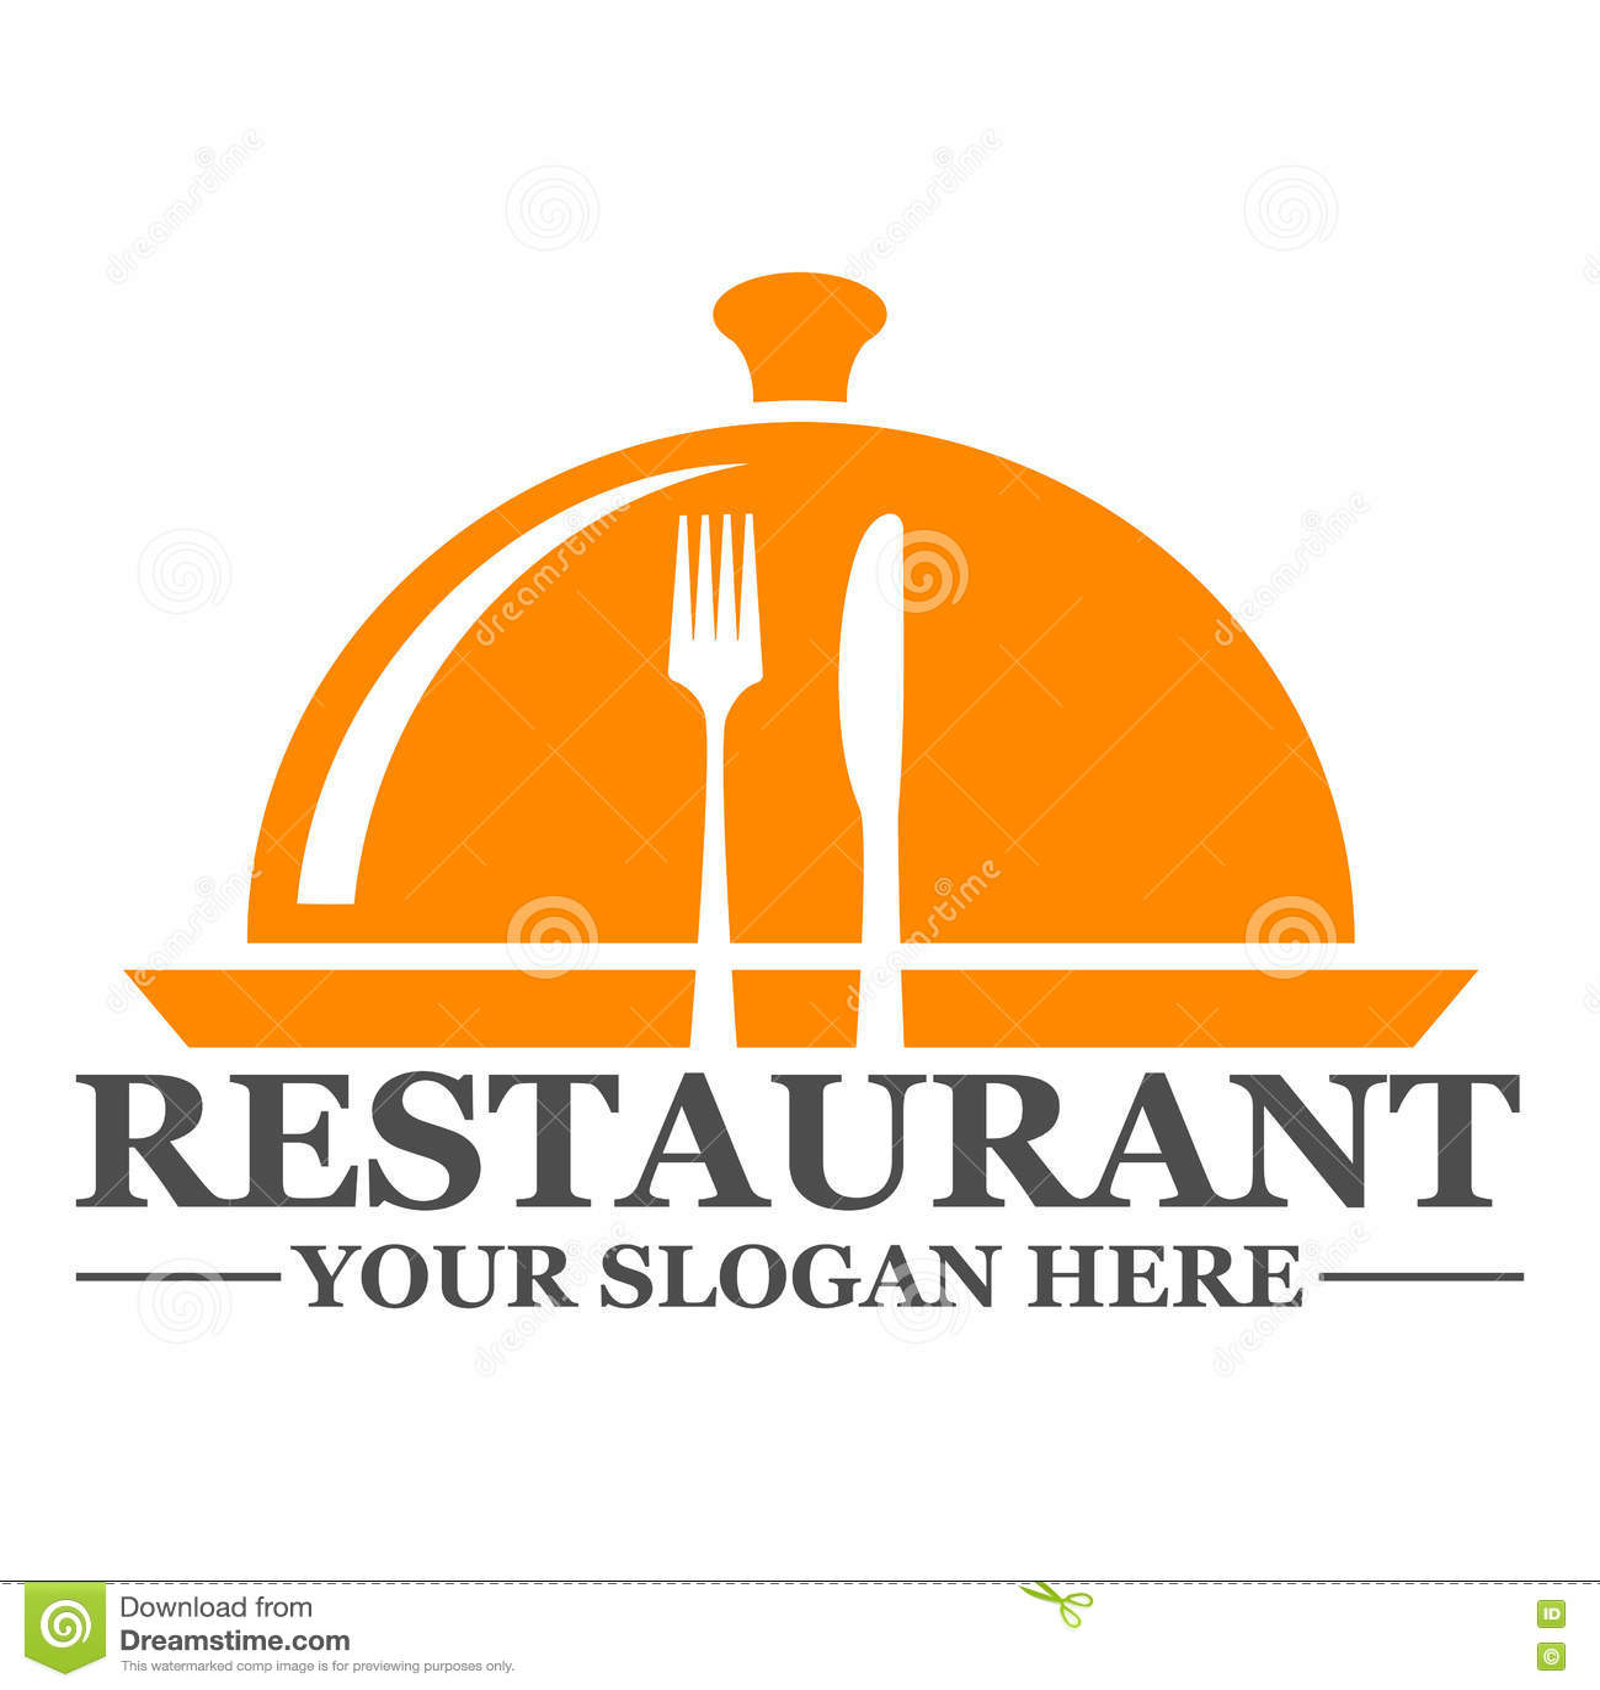 Restaurant Logo Template Design Stock Vector Illustration Of Holiday Label 81728907